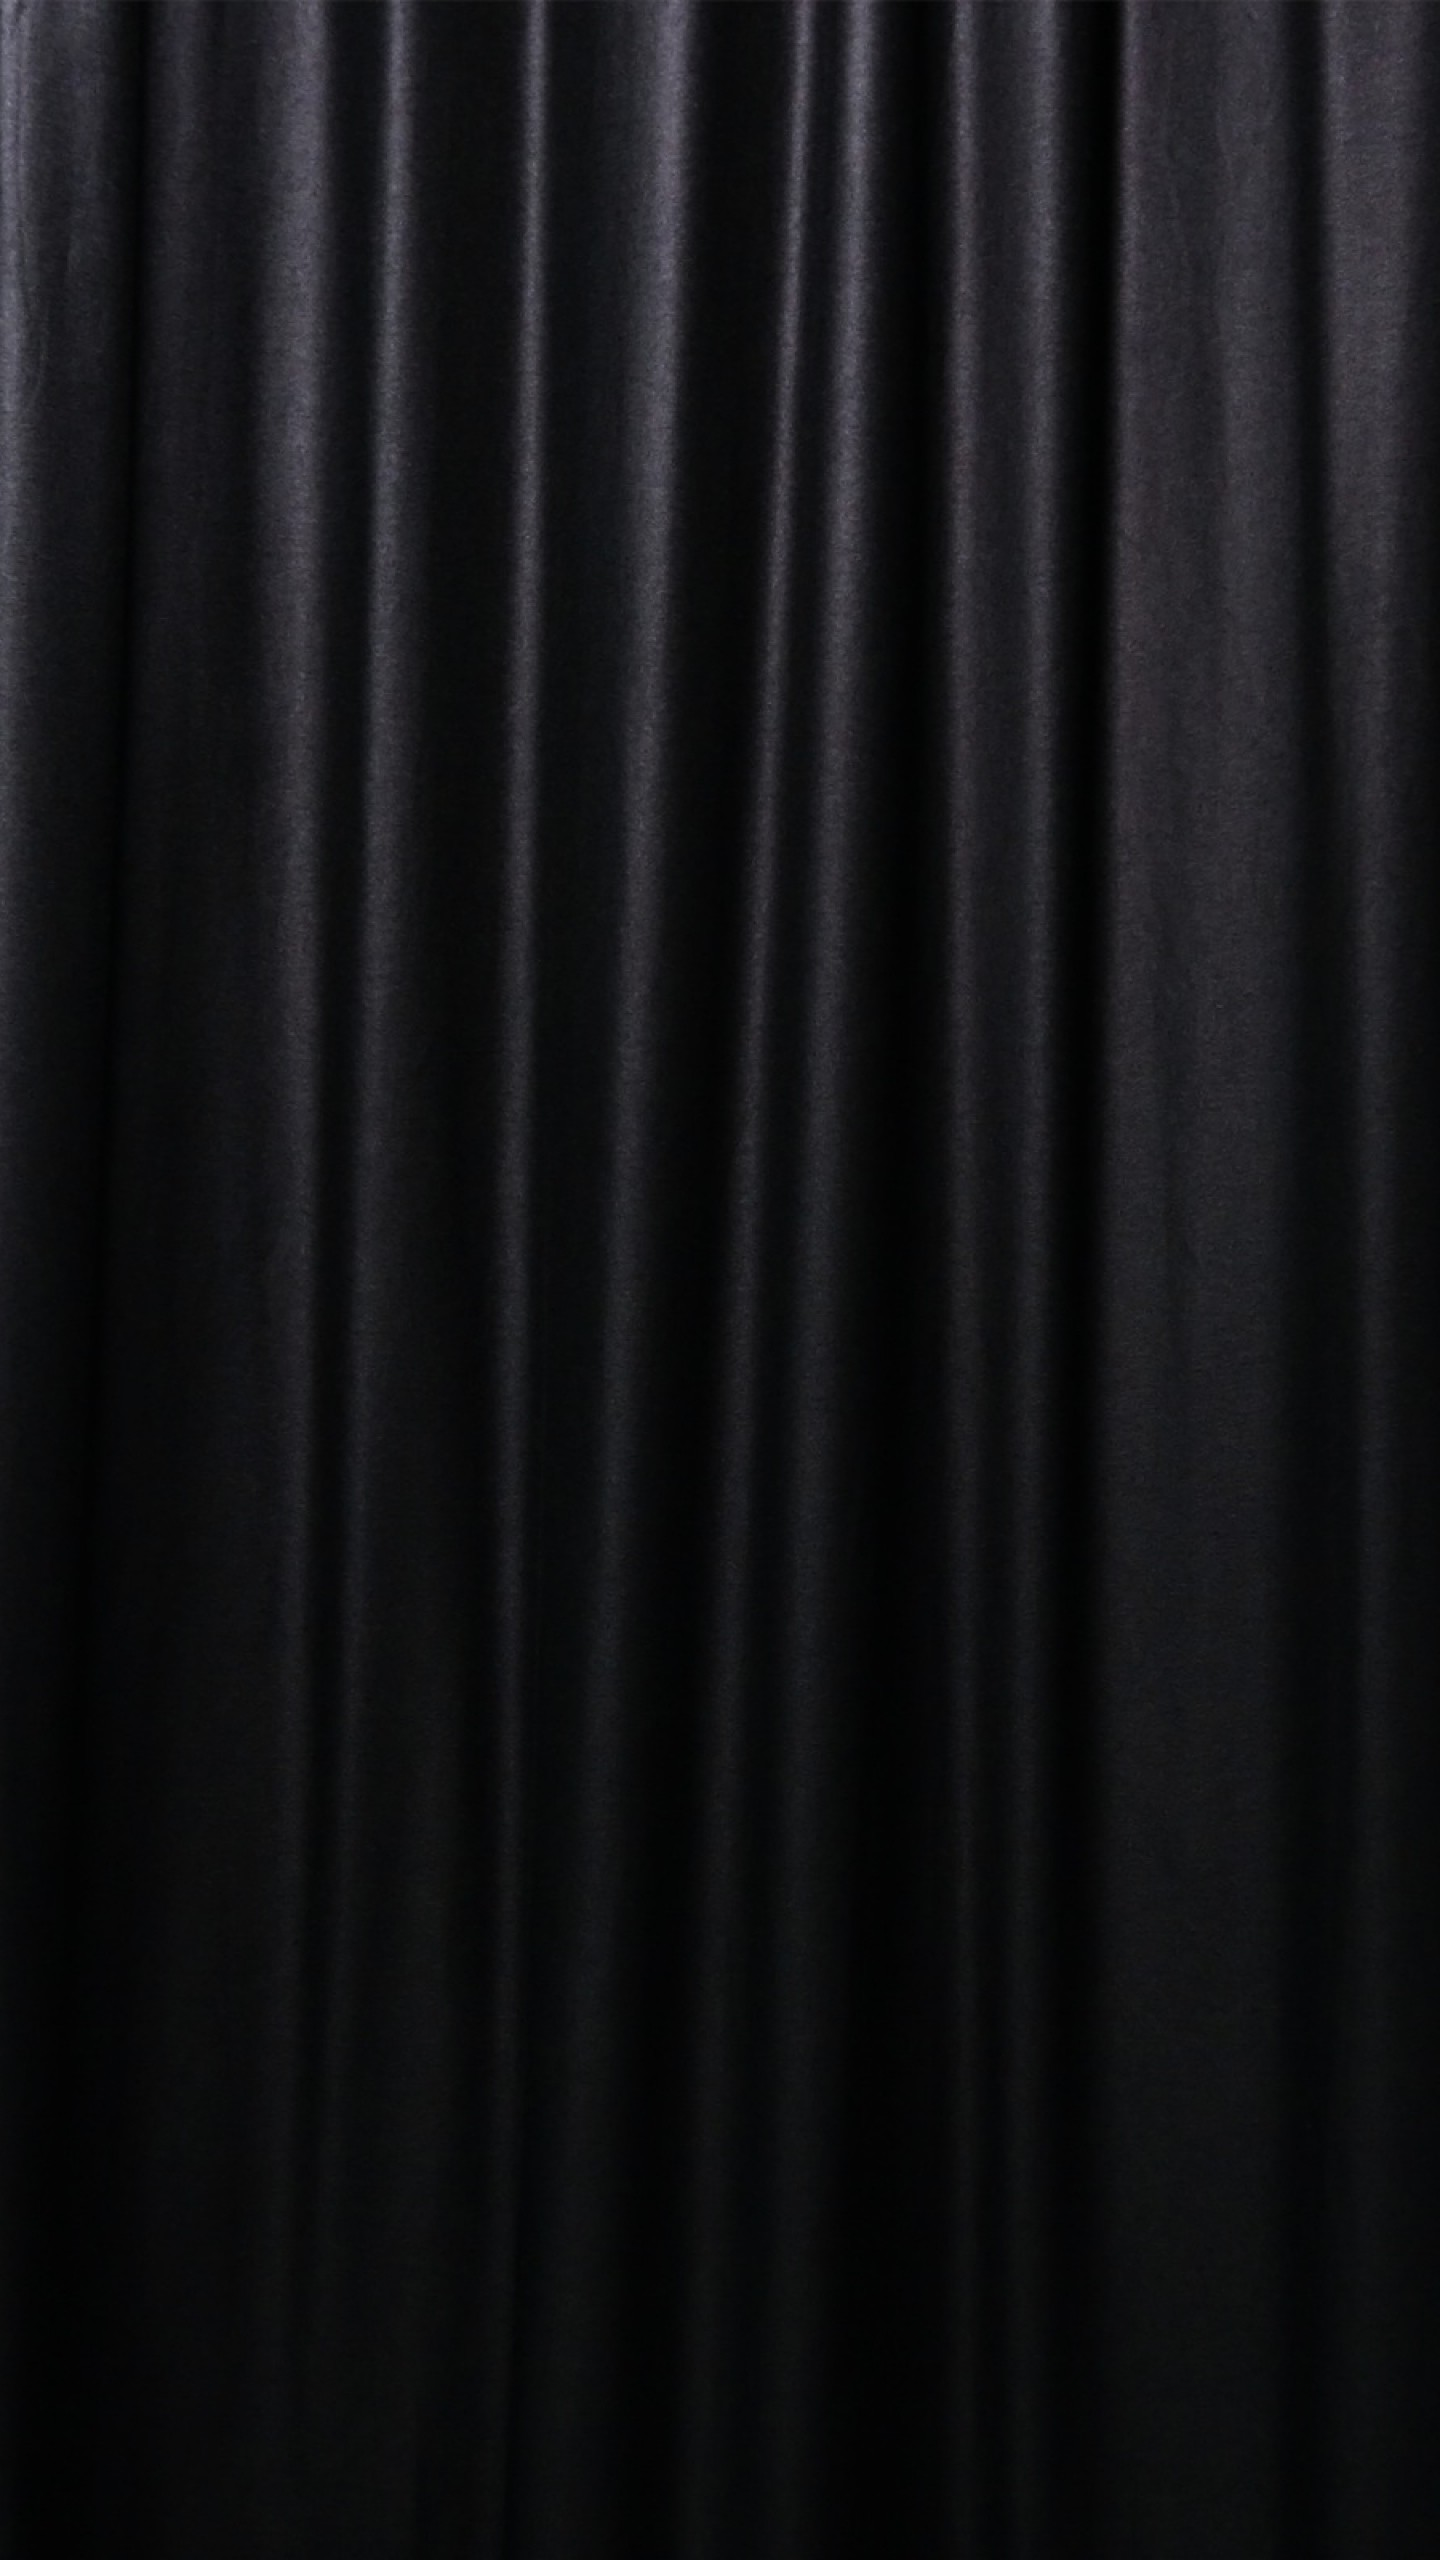 Wallpaper fabric, lines, vertical, dark